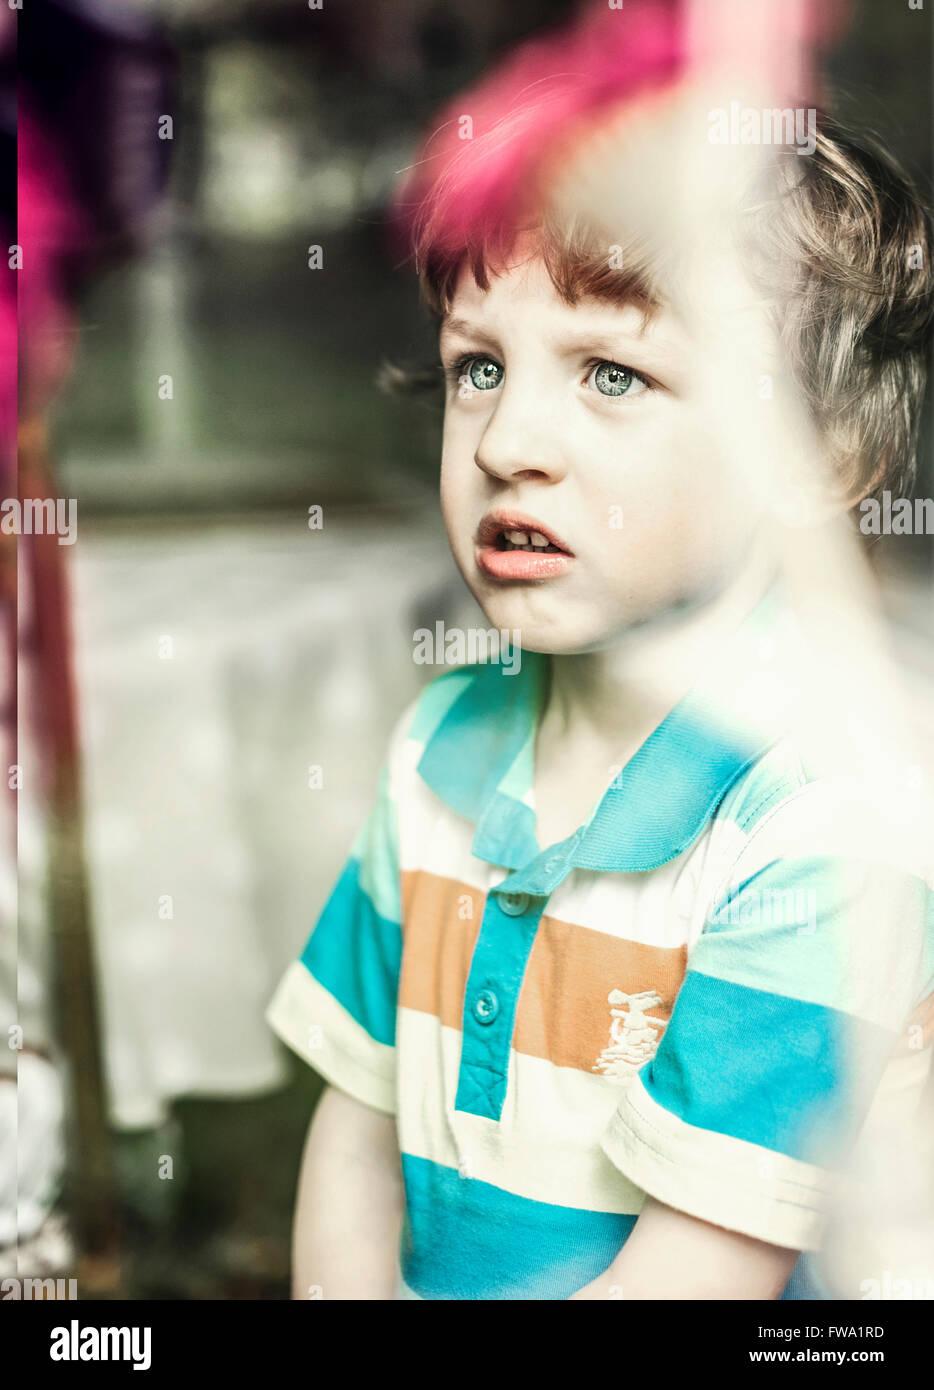 a small boy Stock Photo